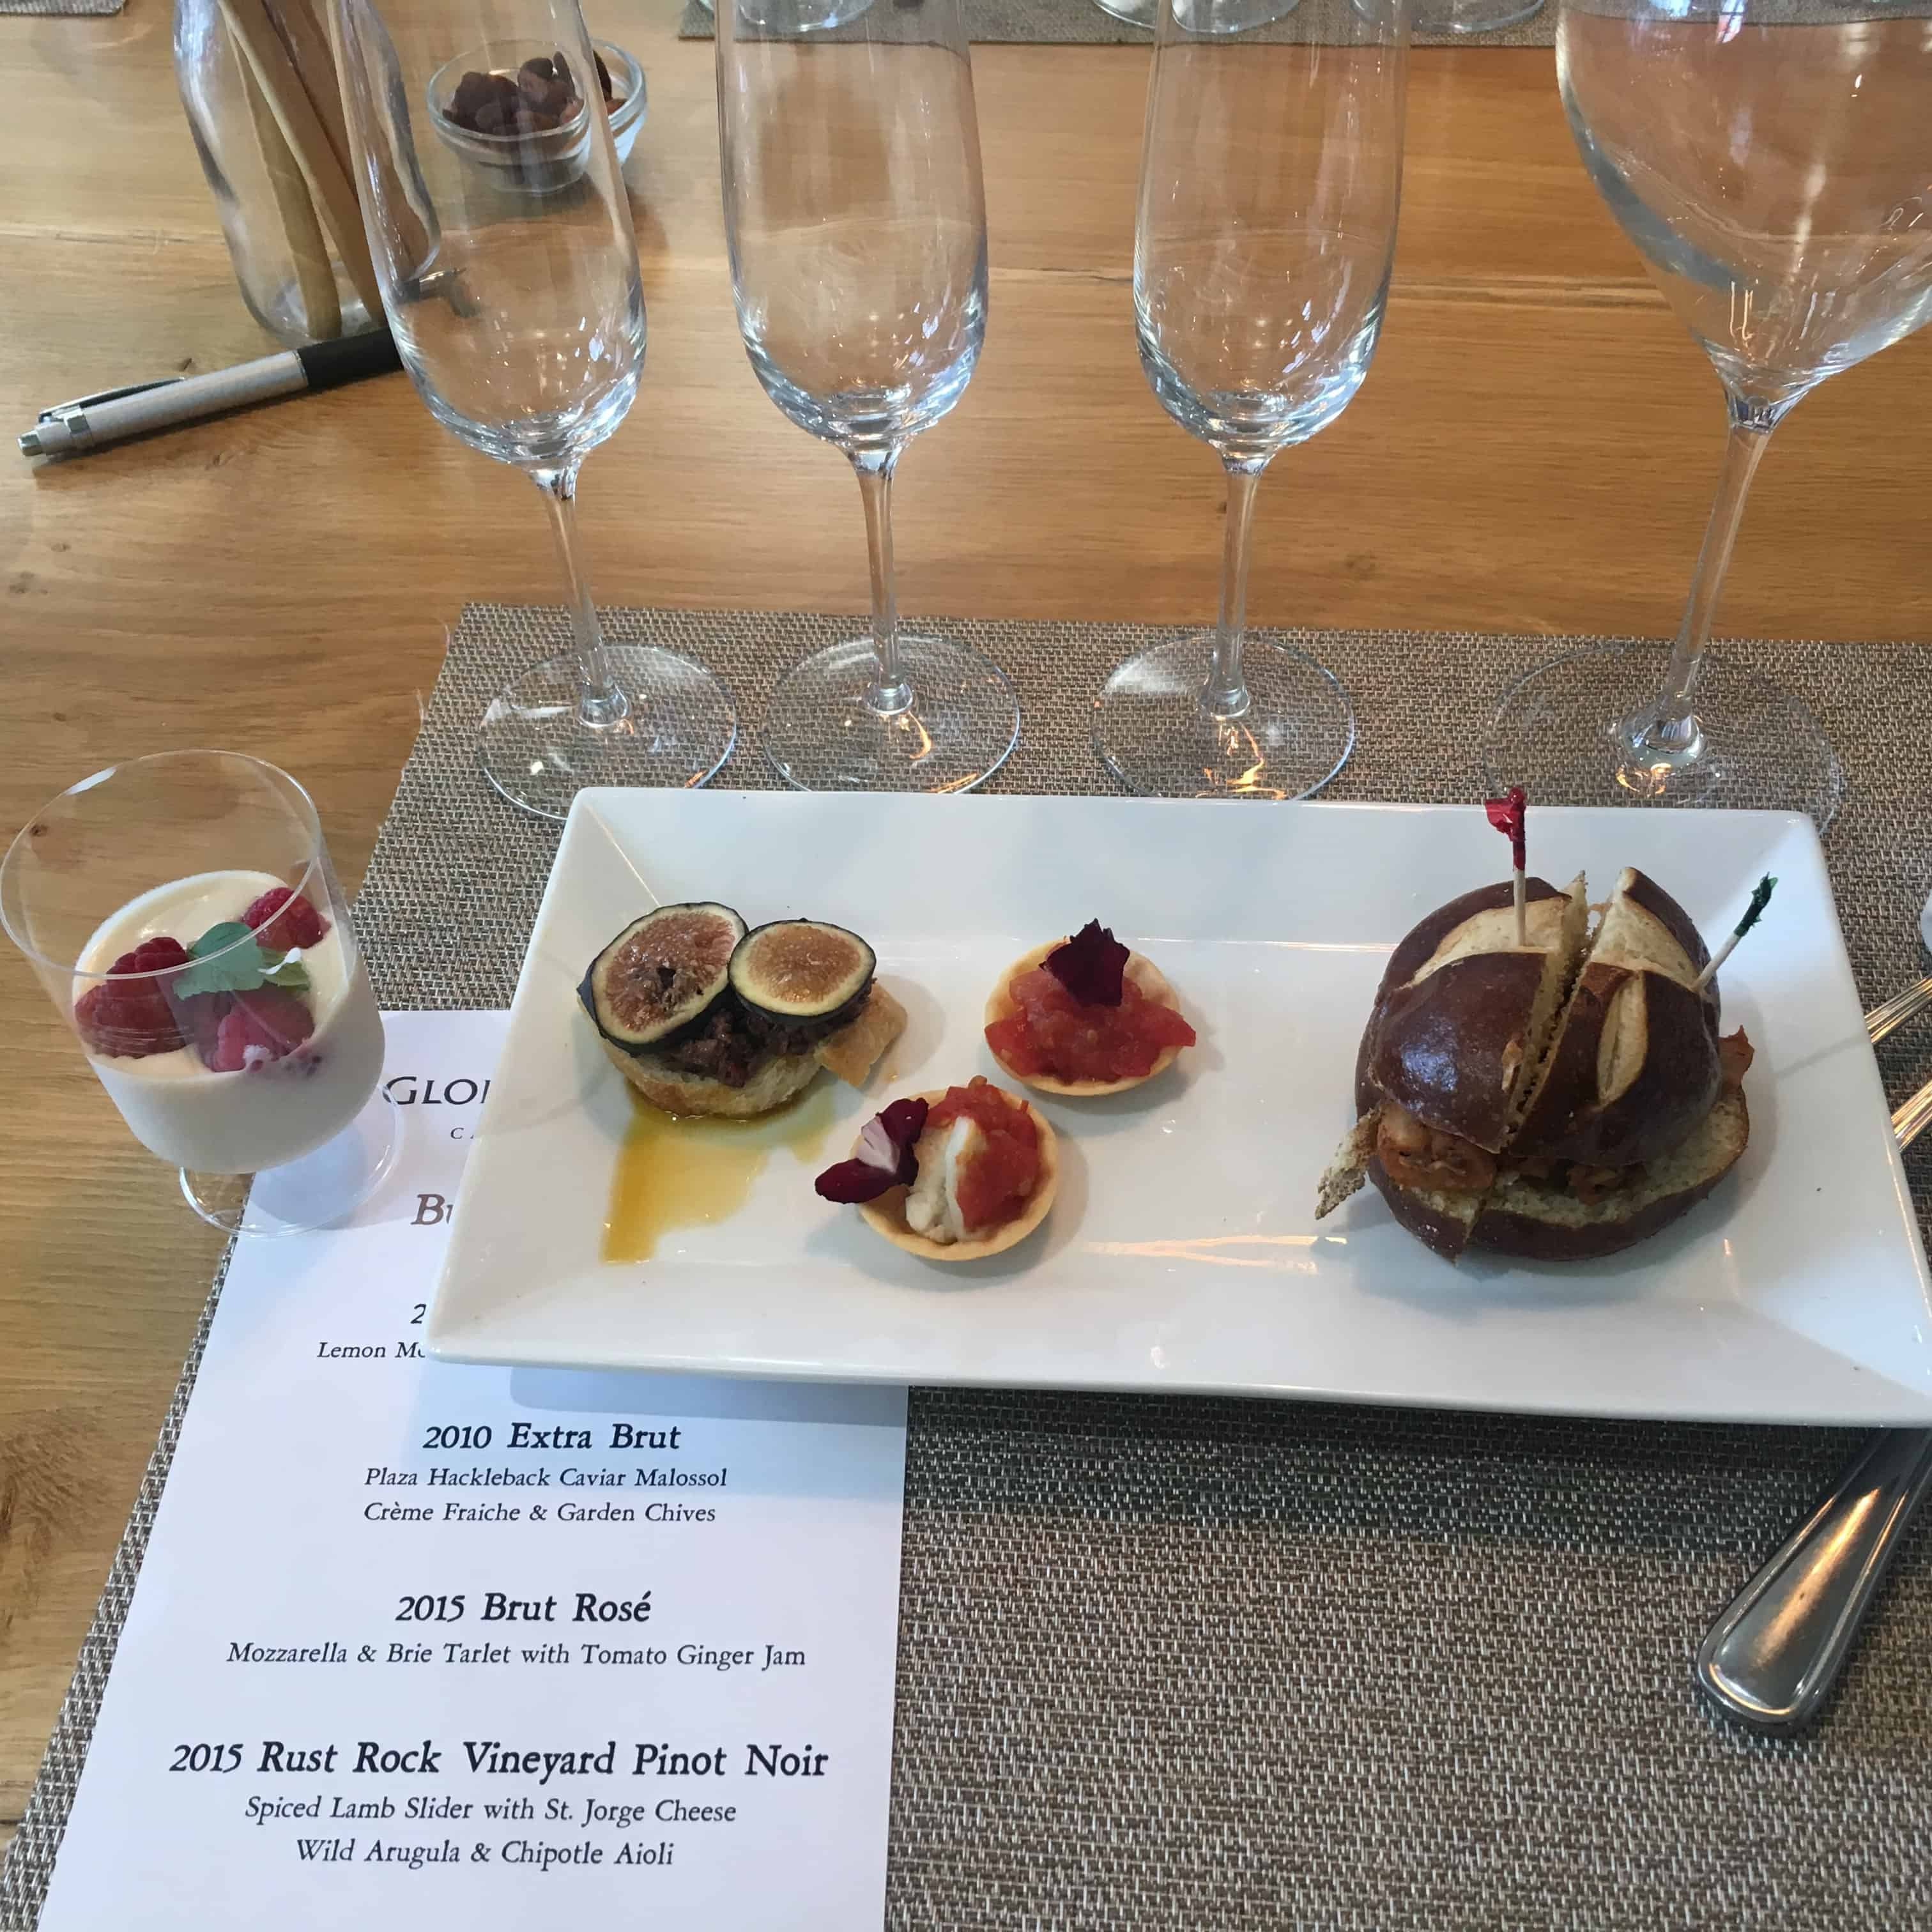 Wine tasting and vegan food pairing at Gloria Ferrer winery in Sonoma. https://trimazing.com/